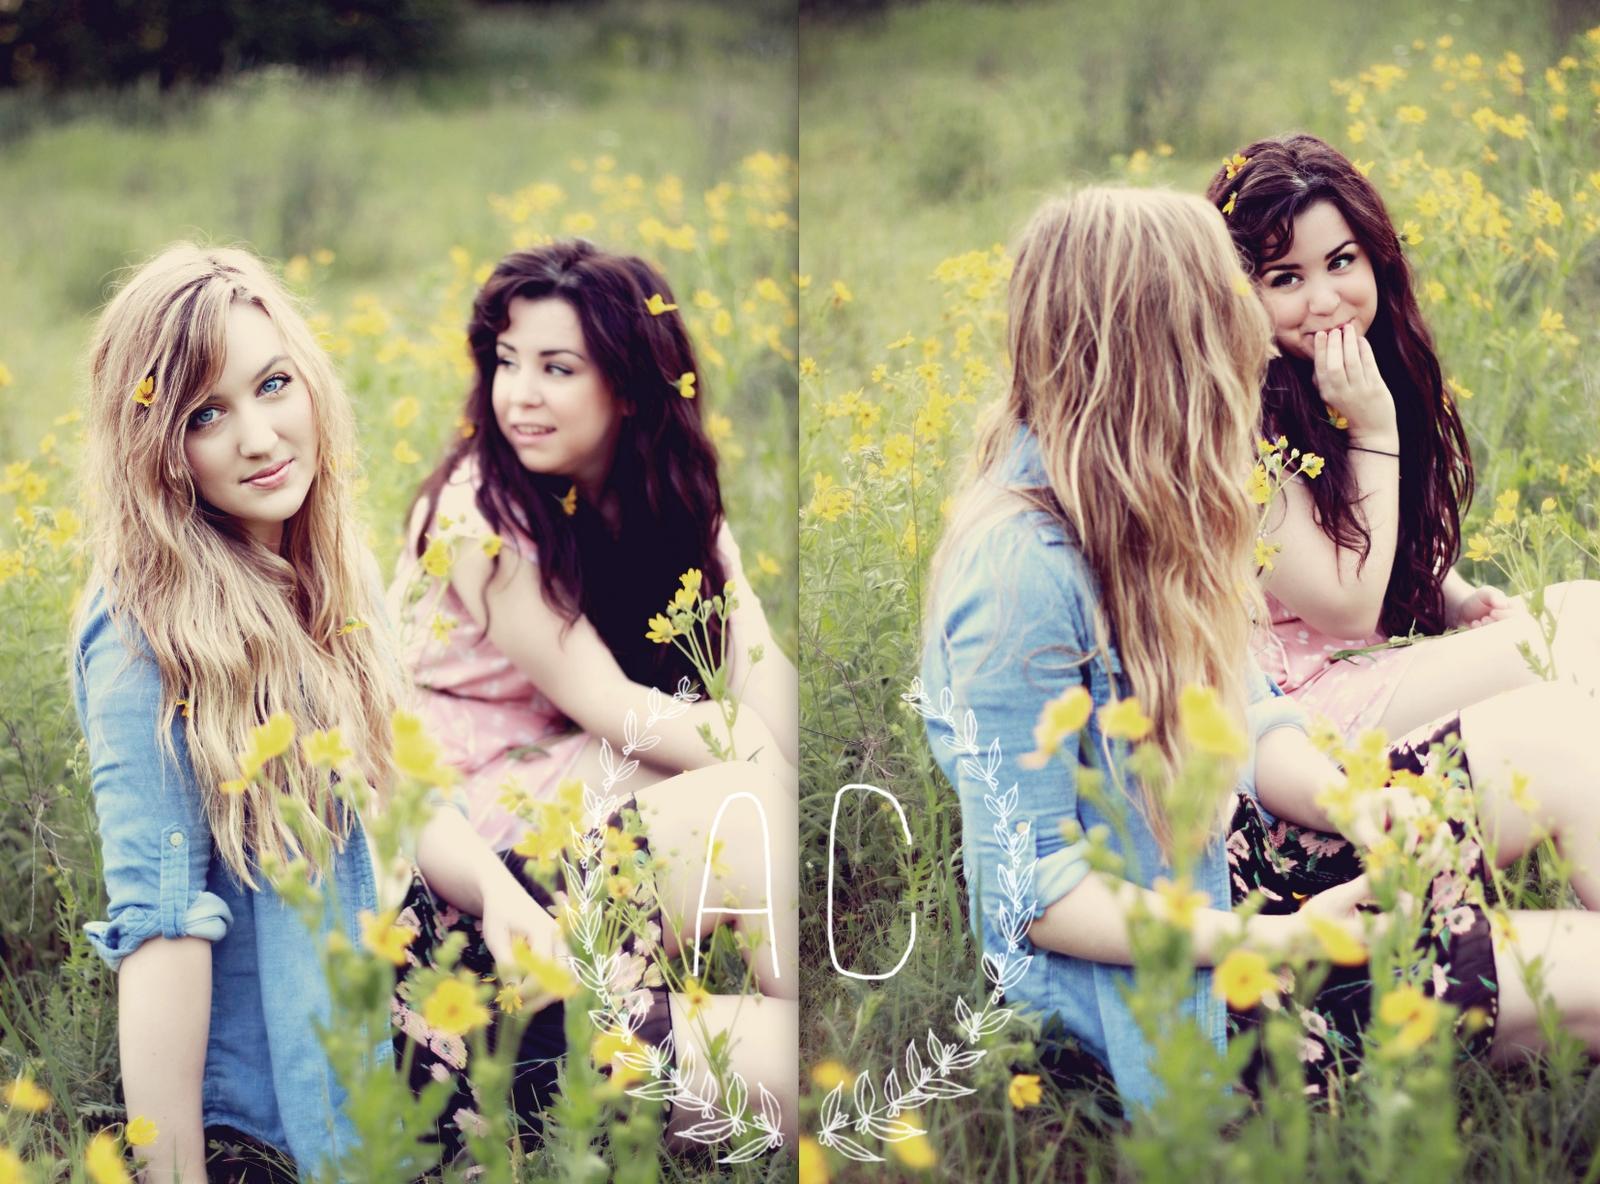 10 Nice Picture Ideas For Best Friends best friend photo shoot ideas the ashlie chandler creative 1 2021